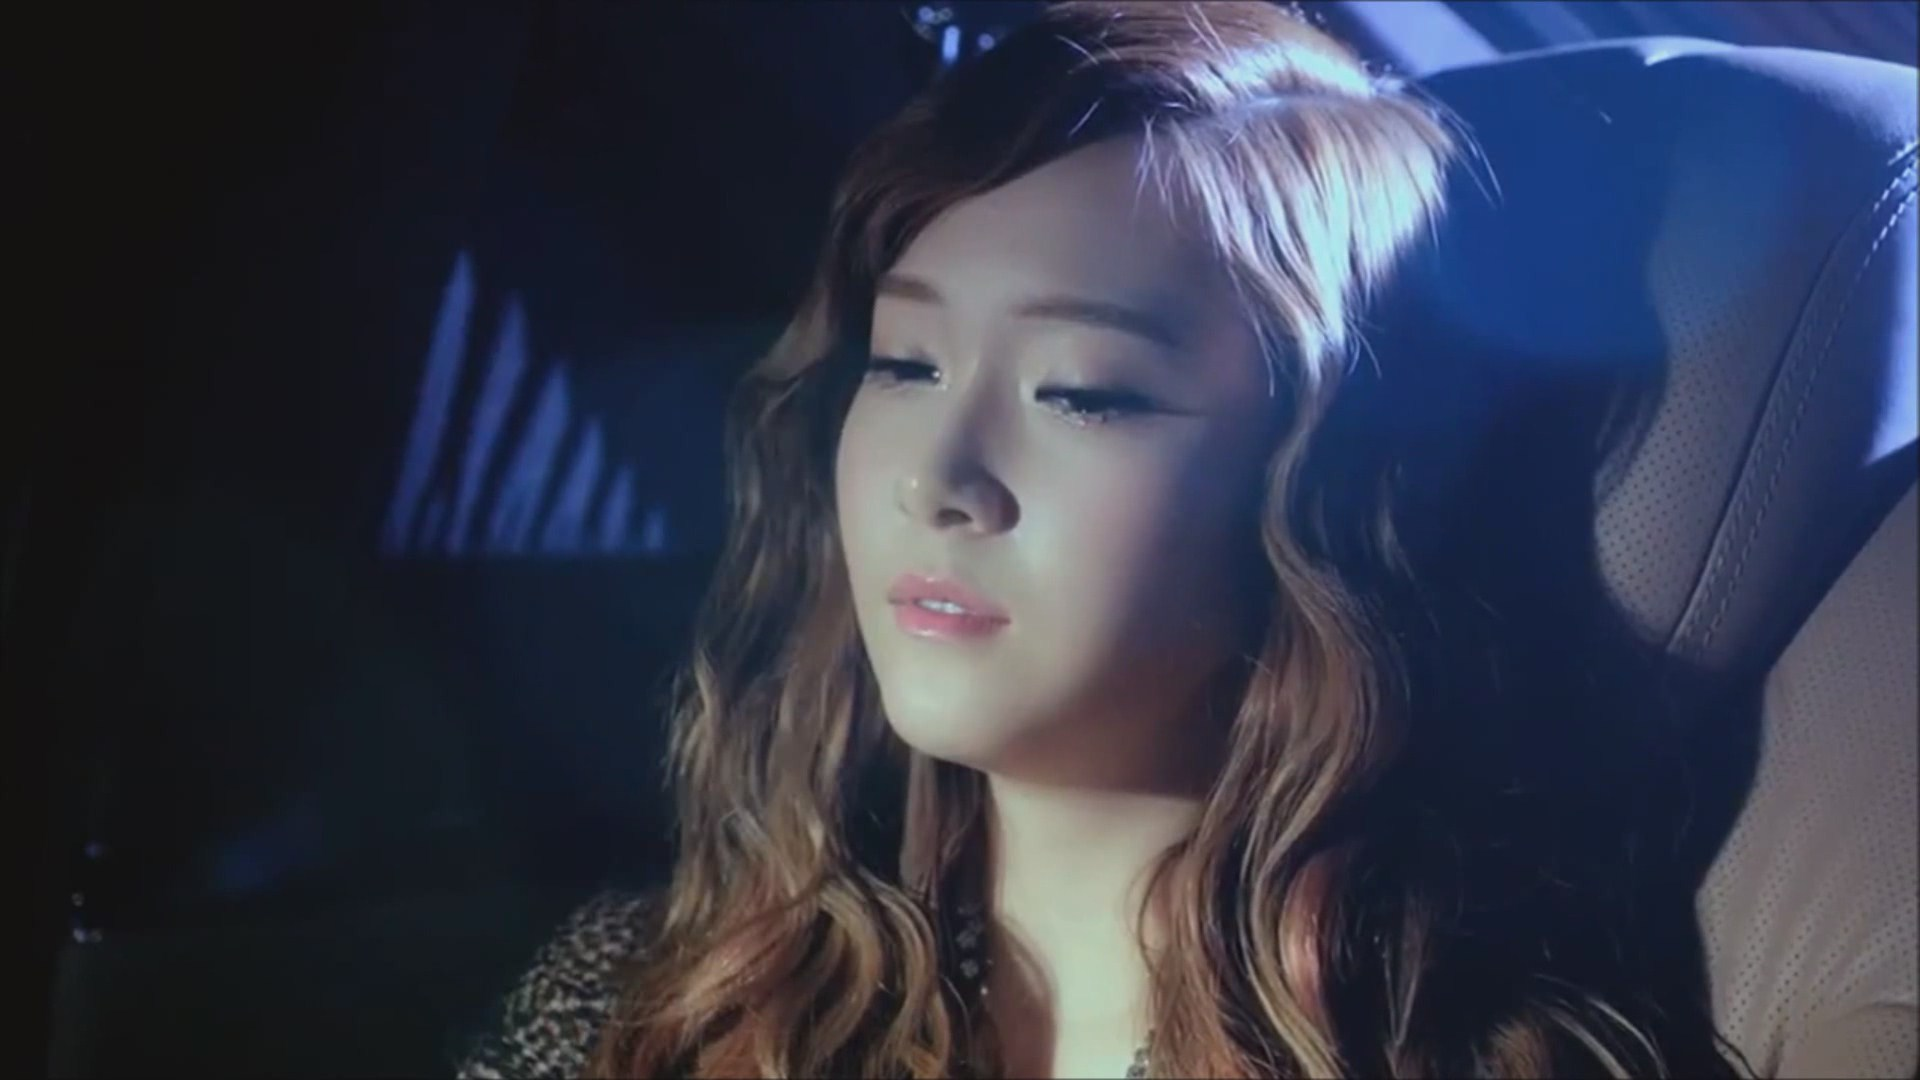 Girls Generation Time Machine PV teaser - Girls